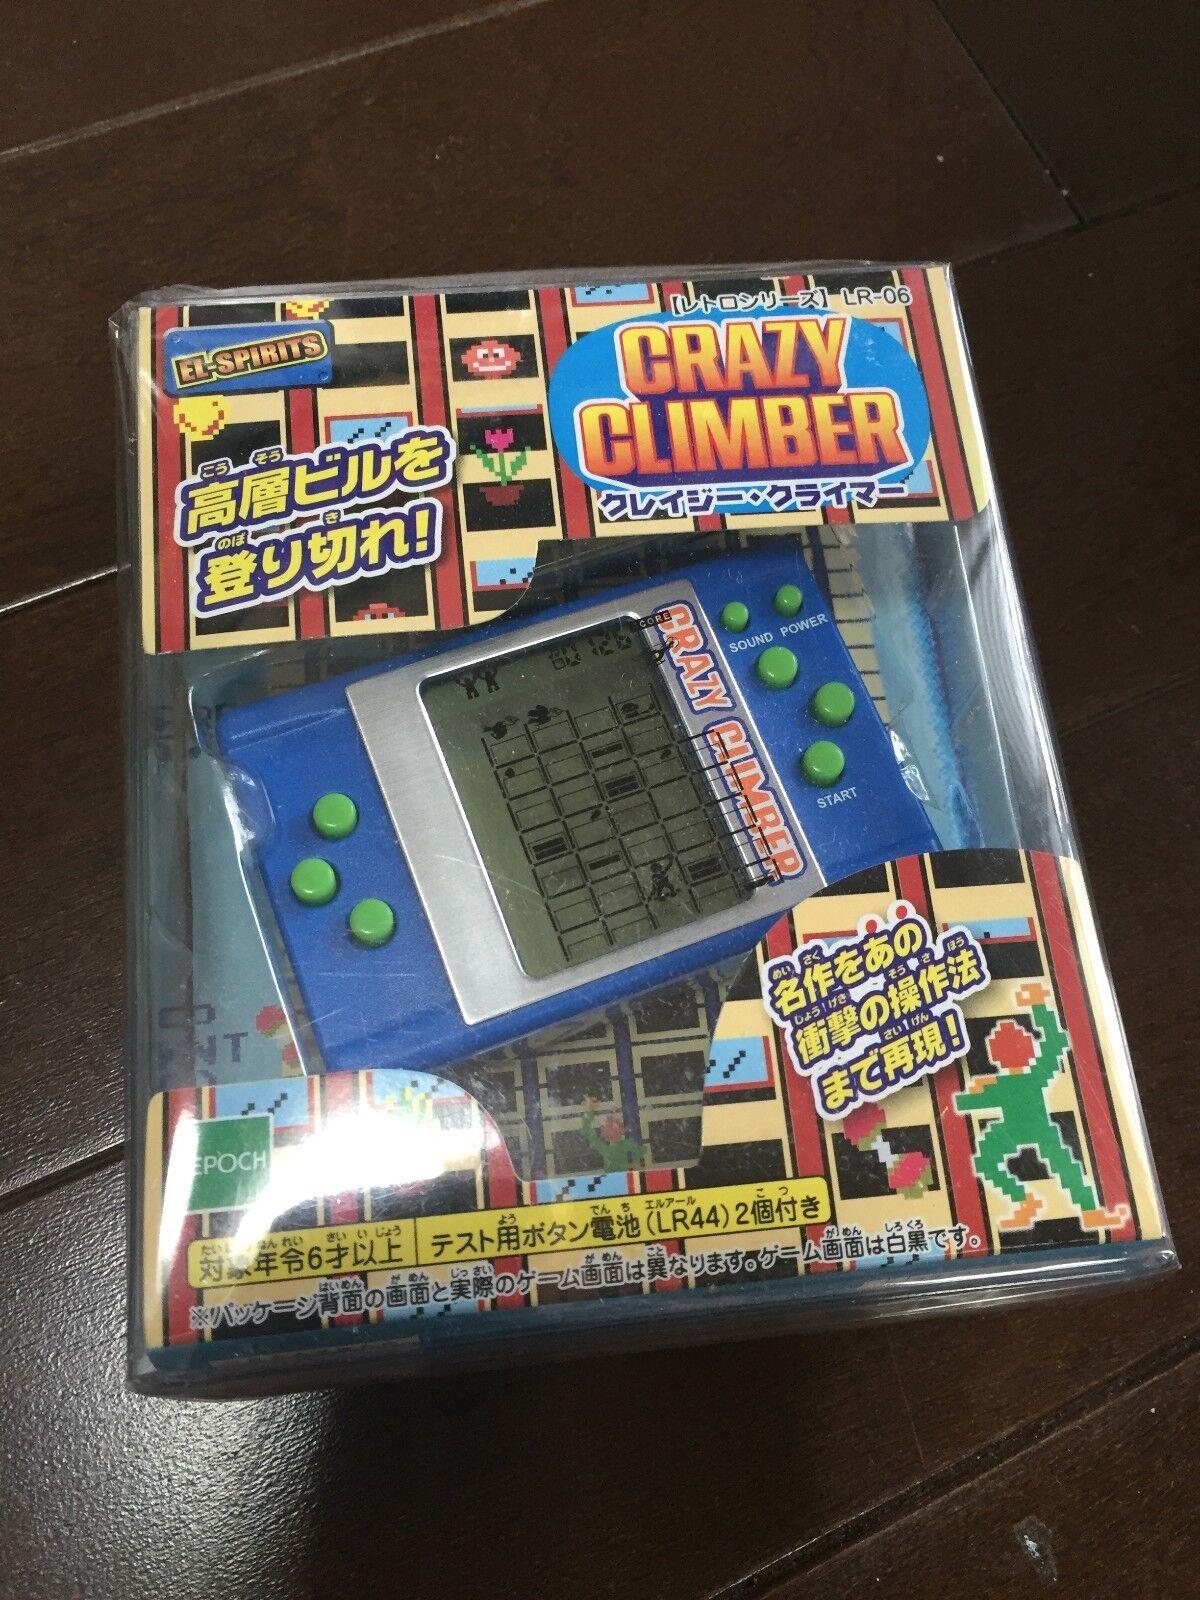 CRAZY CLIMBER handheld LCD LSI game EPOCH EL-SPIRITS LR-06